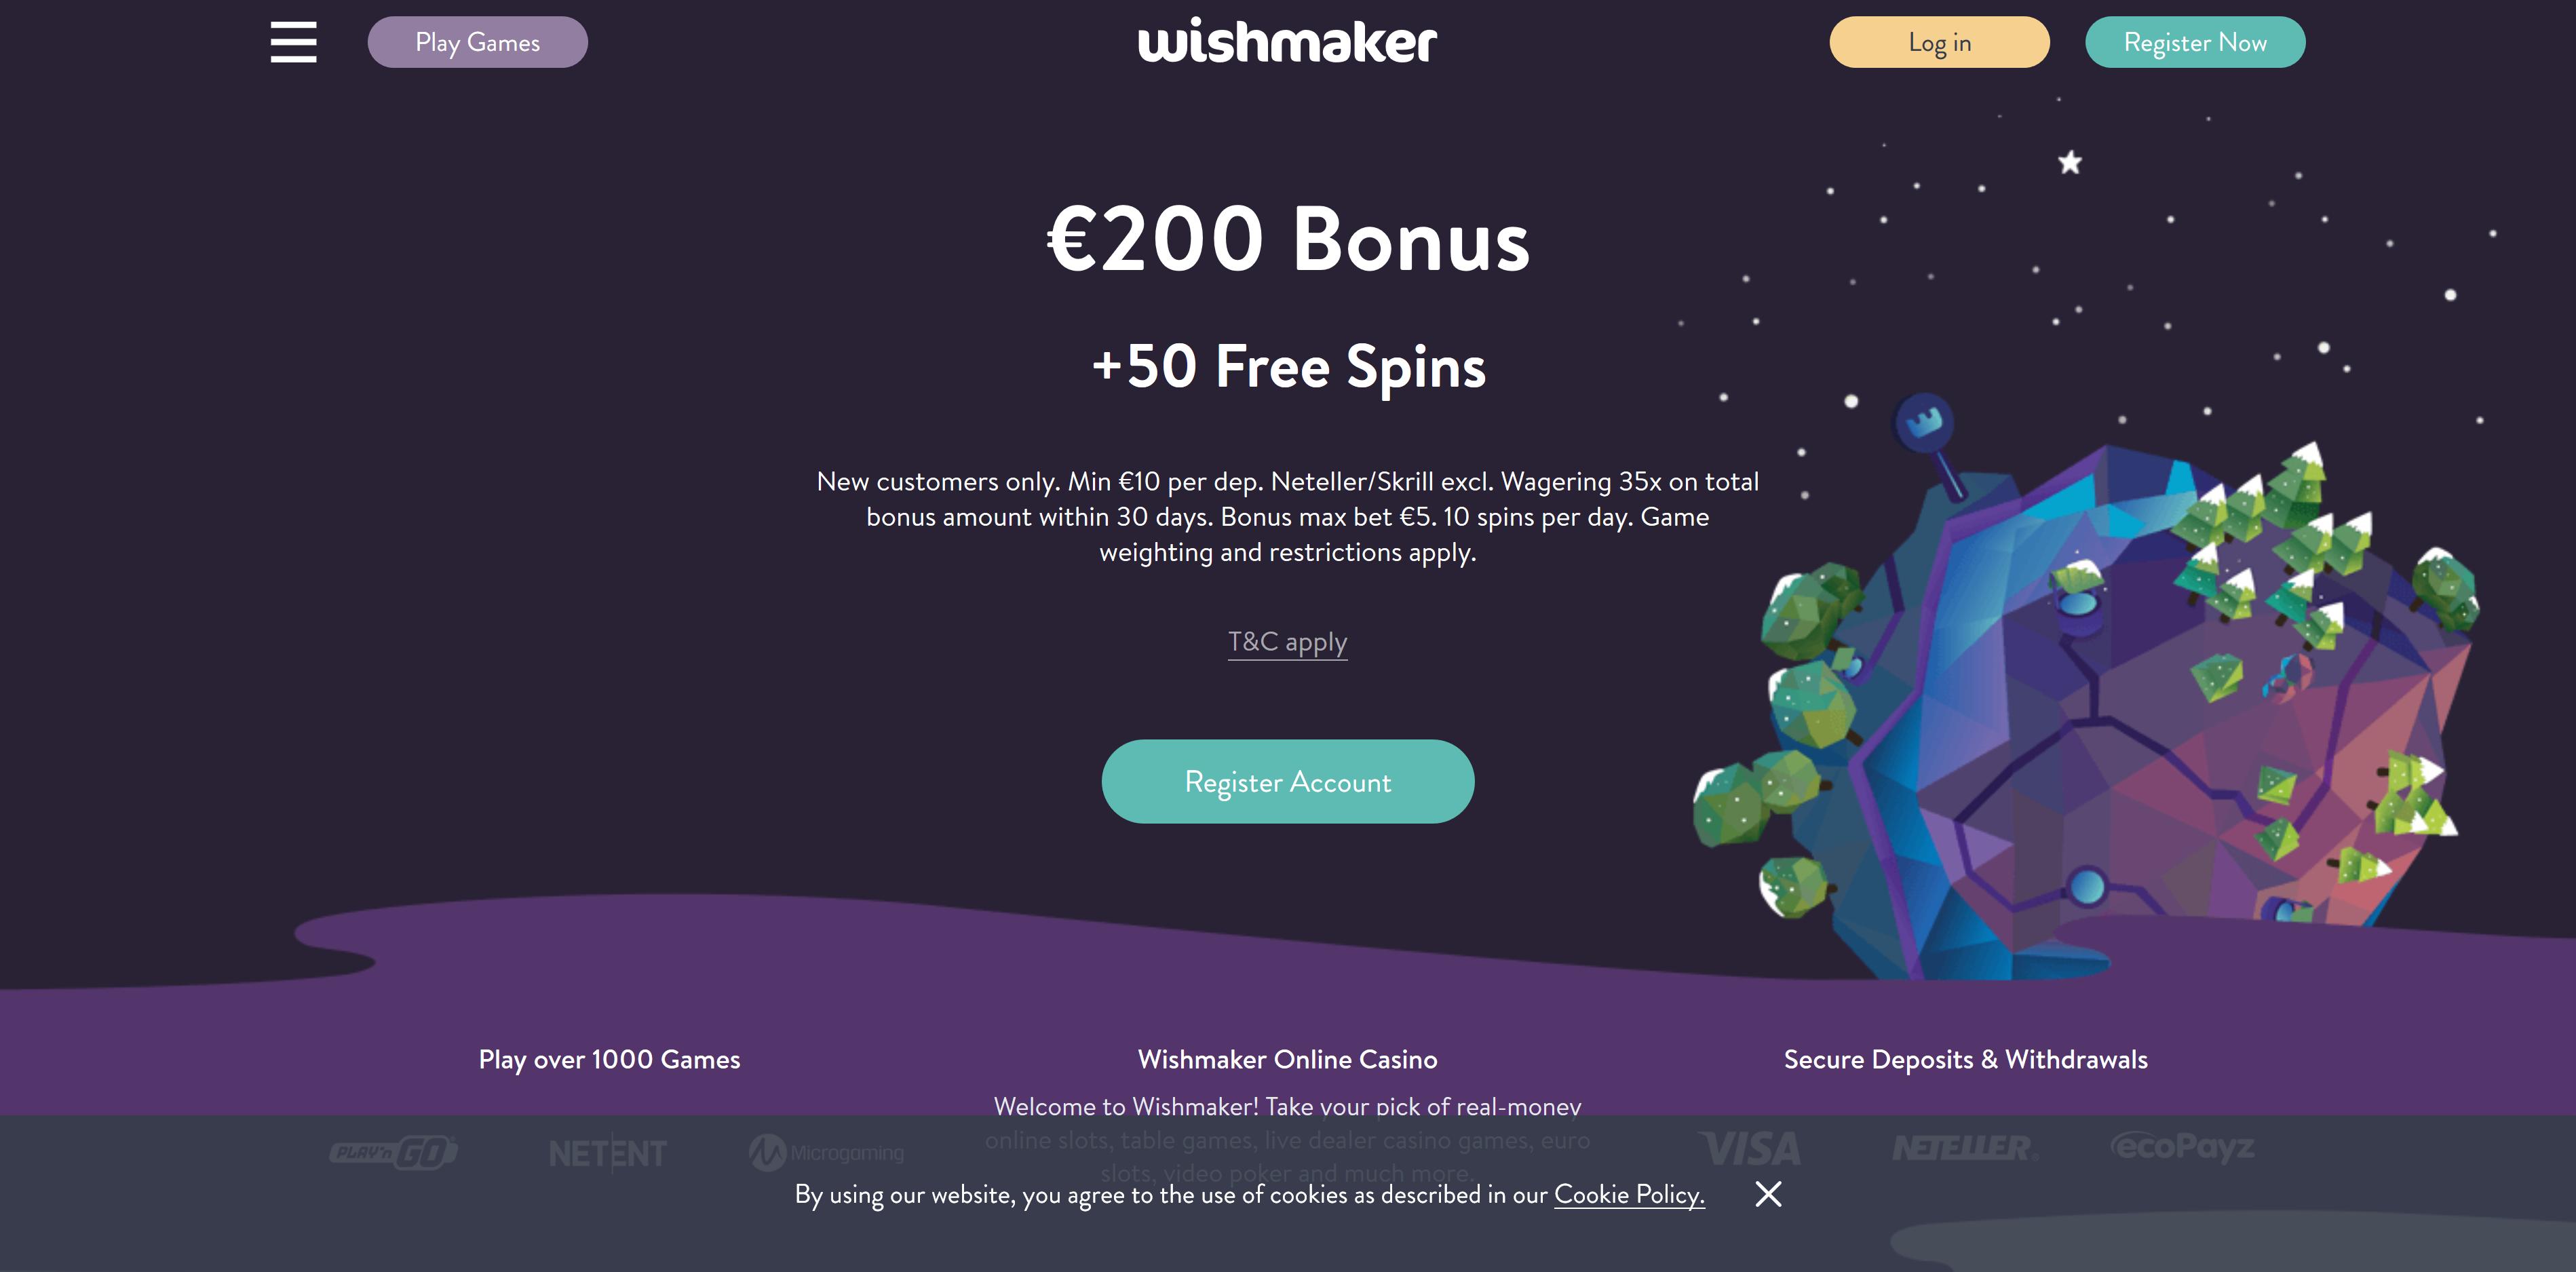 Wishmaker kasino avaa ovensa pian